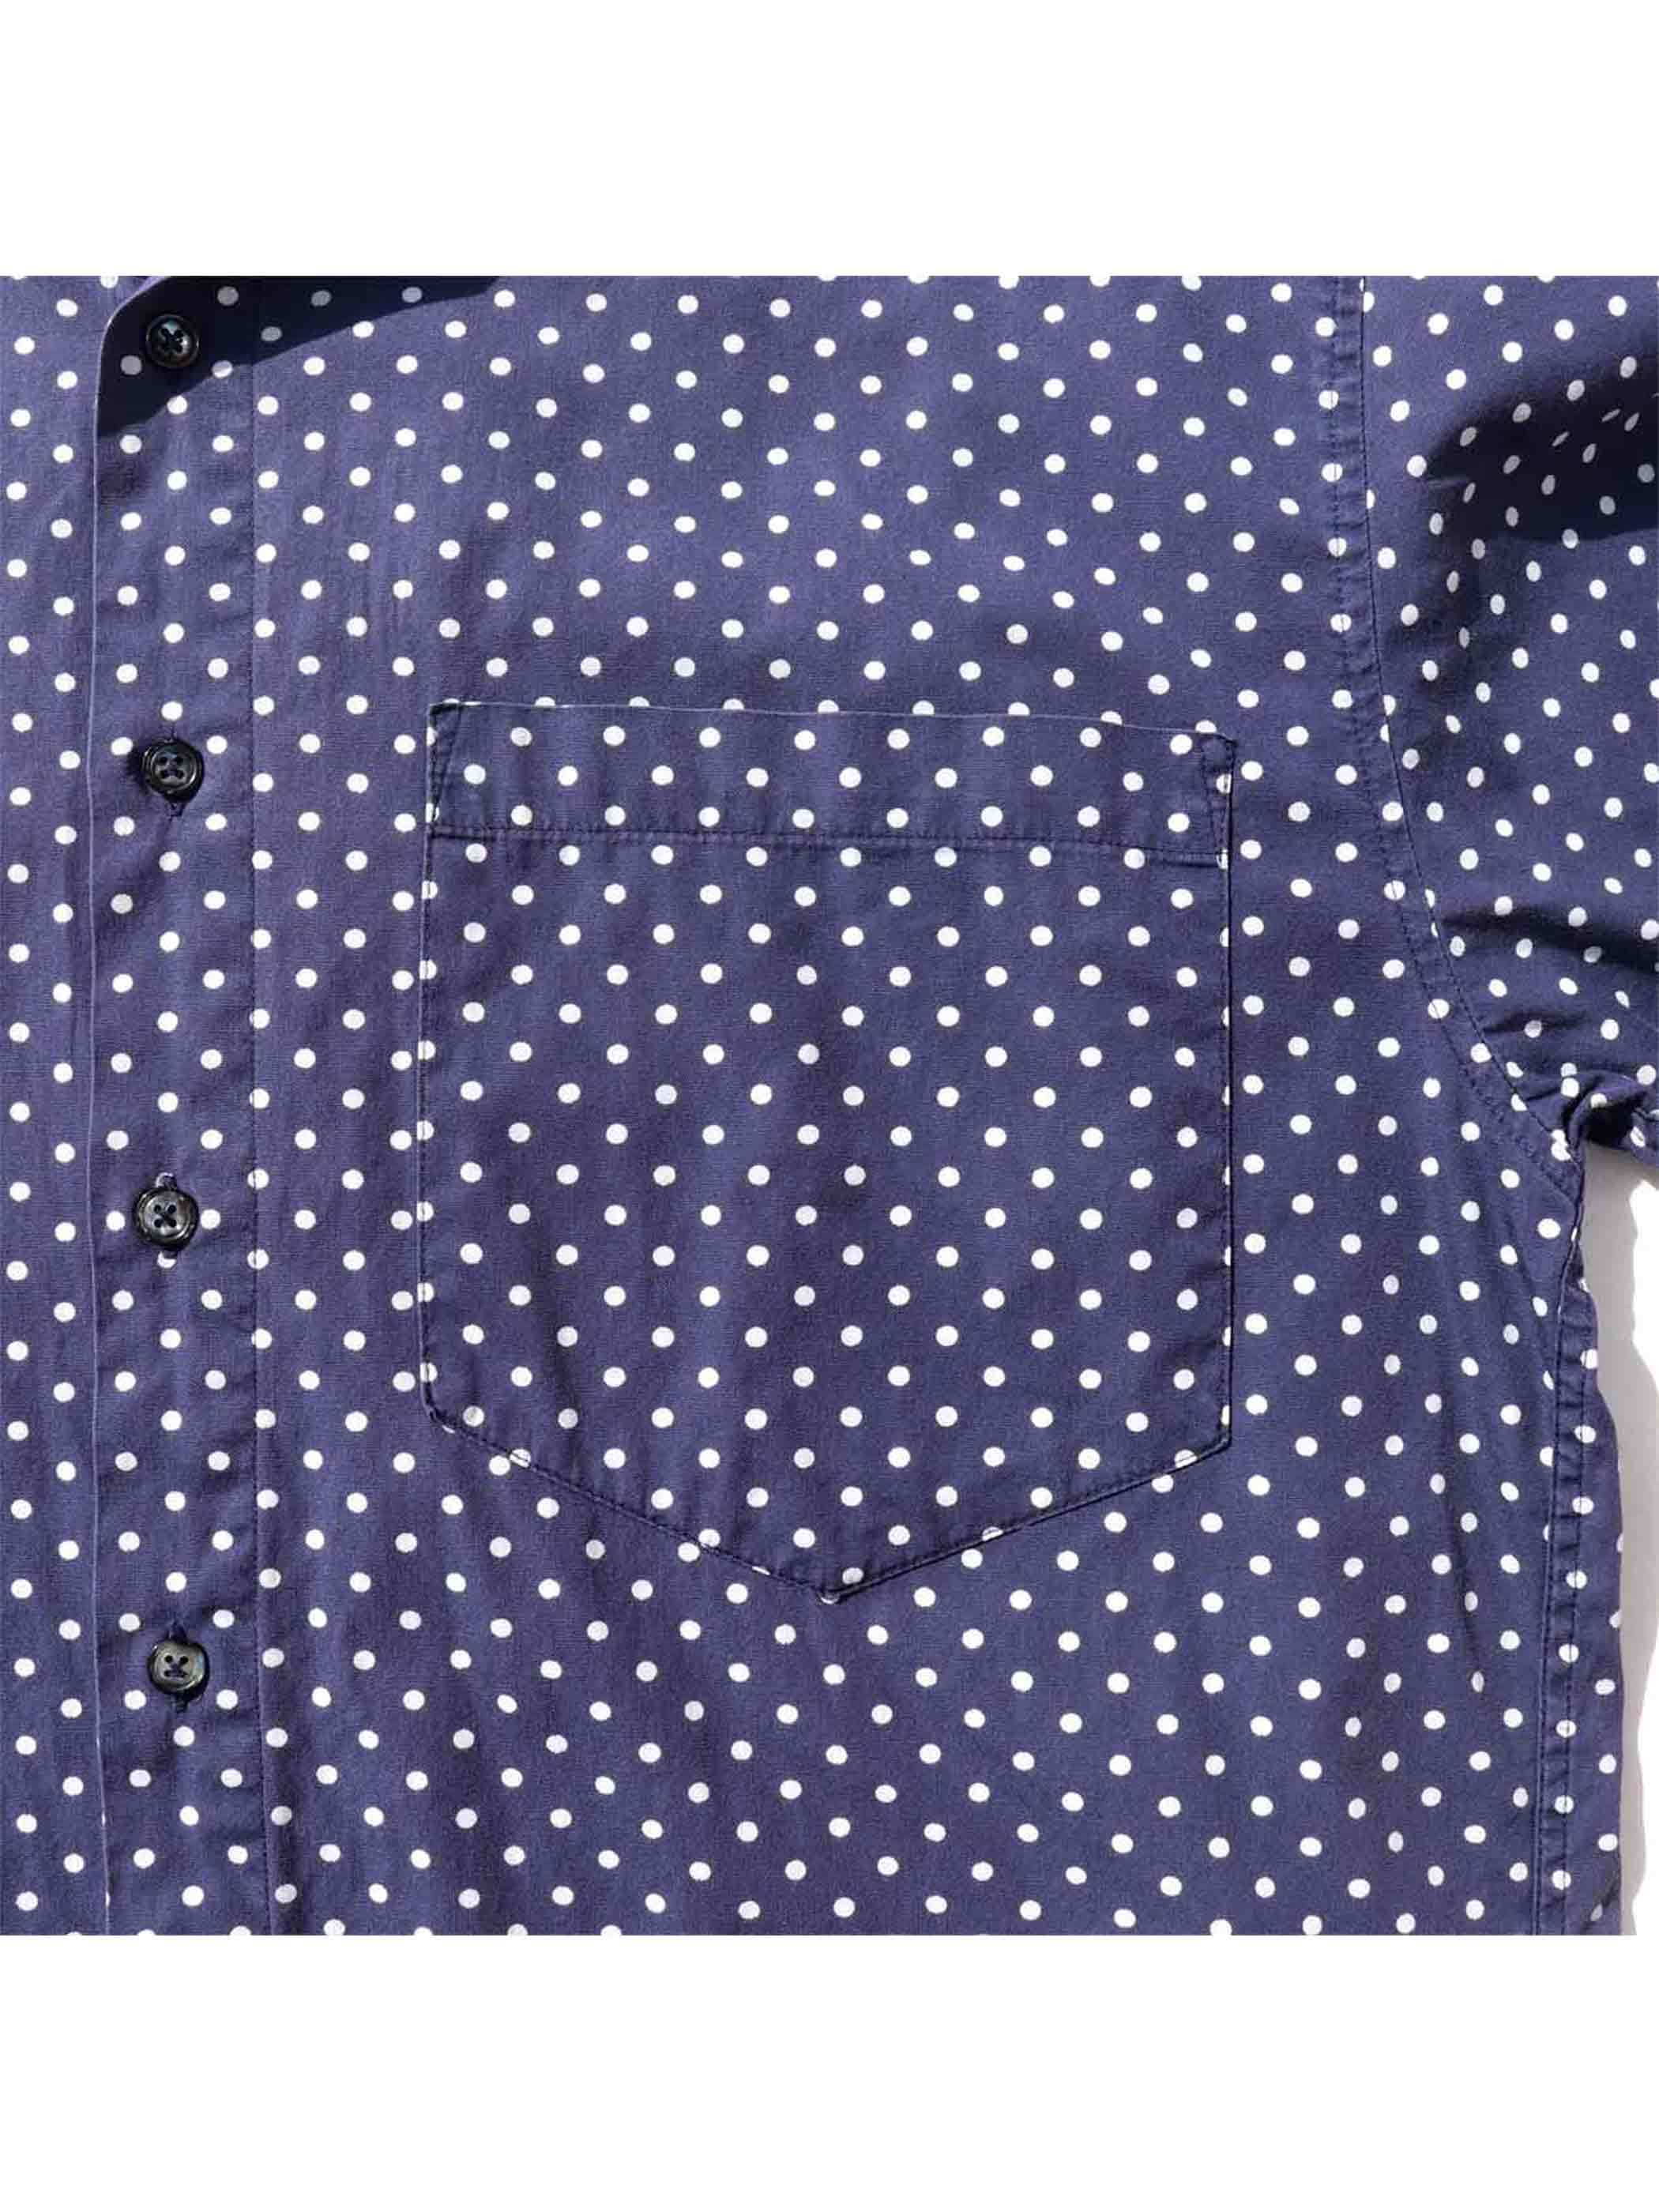 90's GAP Dot Print L/S Shirt [M]